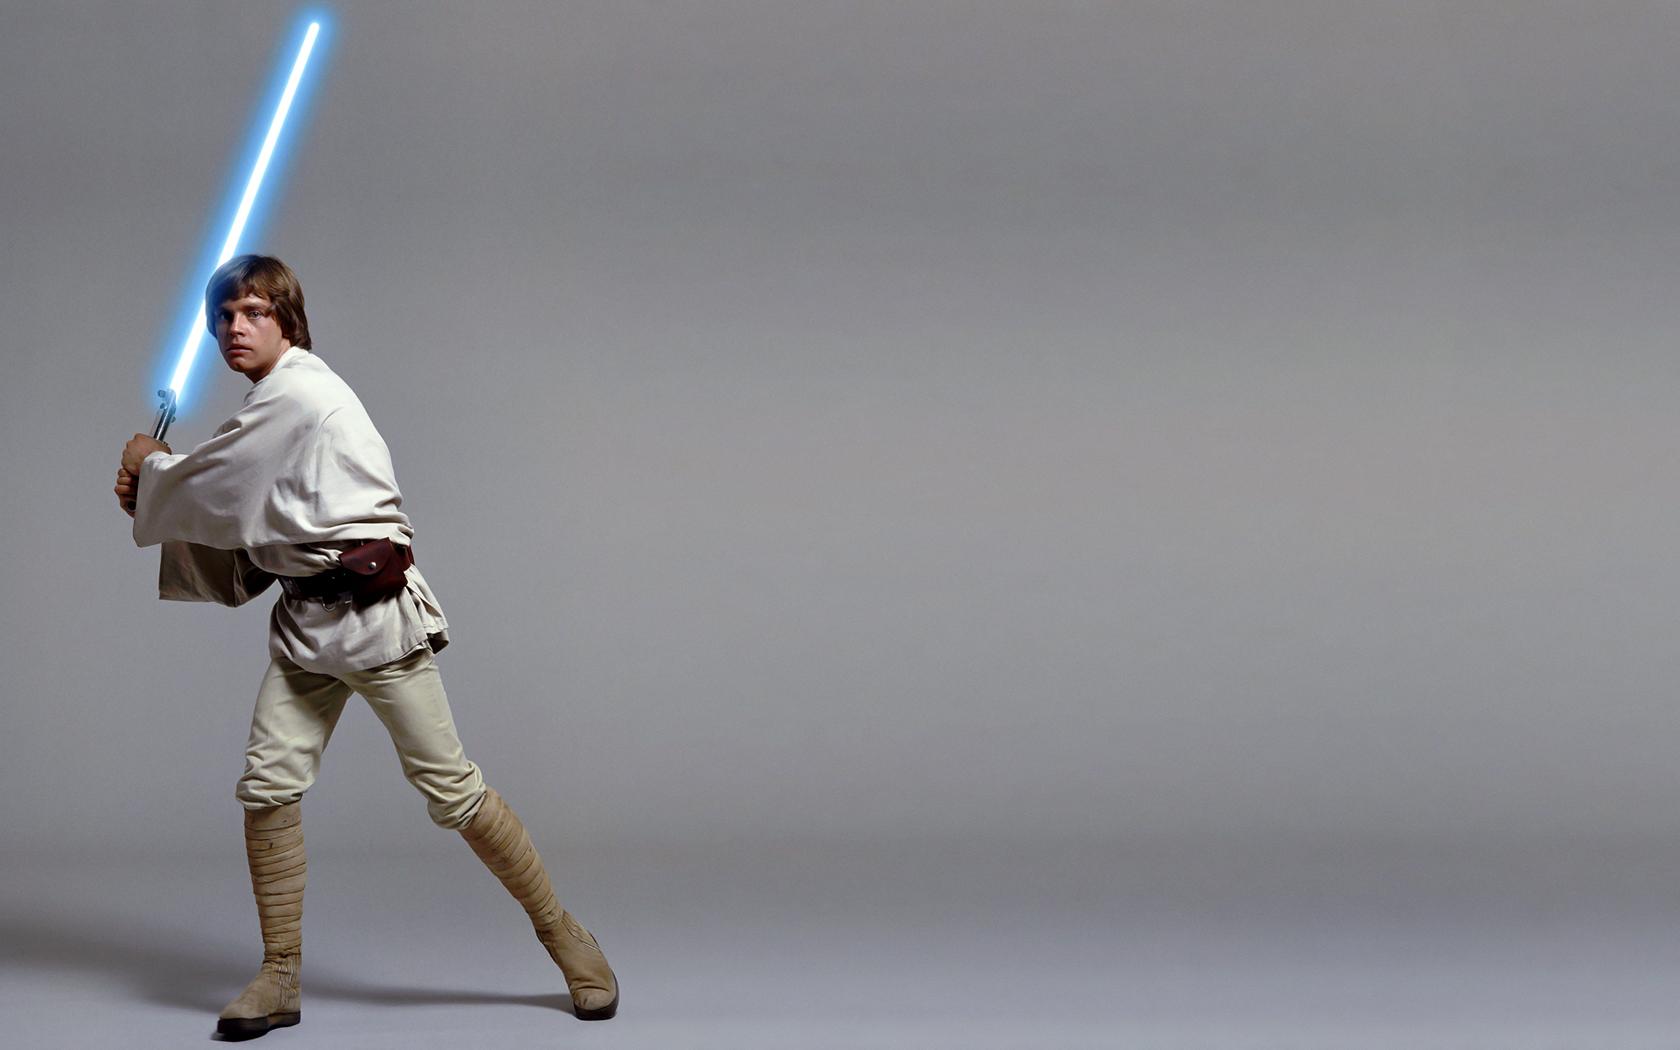 star wars lightsabers luke skywalker mark hamill HD Wallpaper   Movies 1680x1050